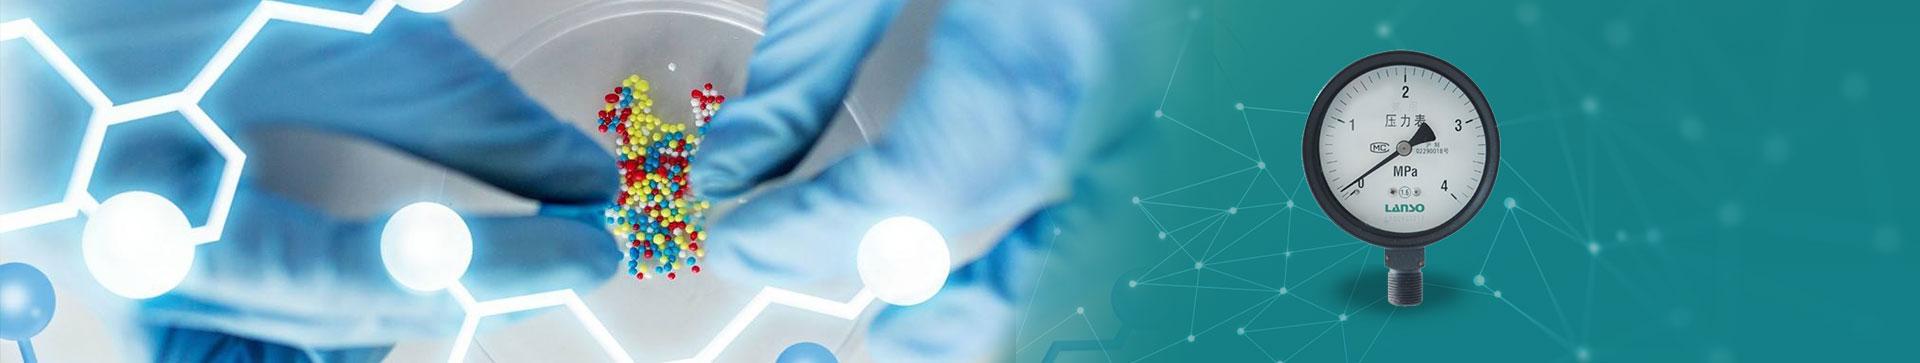 Biotech & Pharmaceuticals